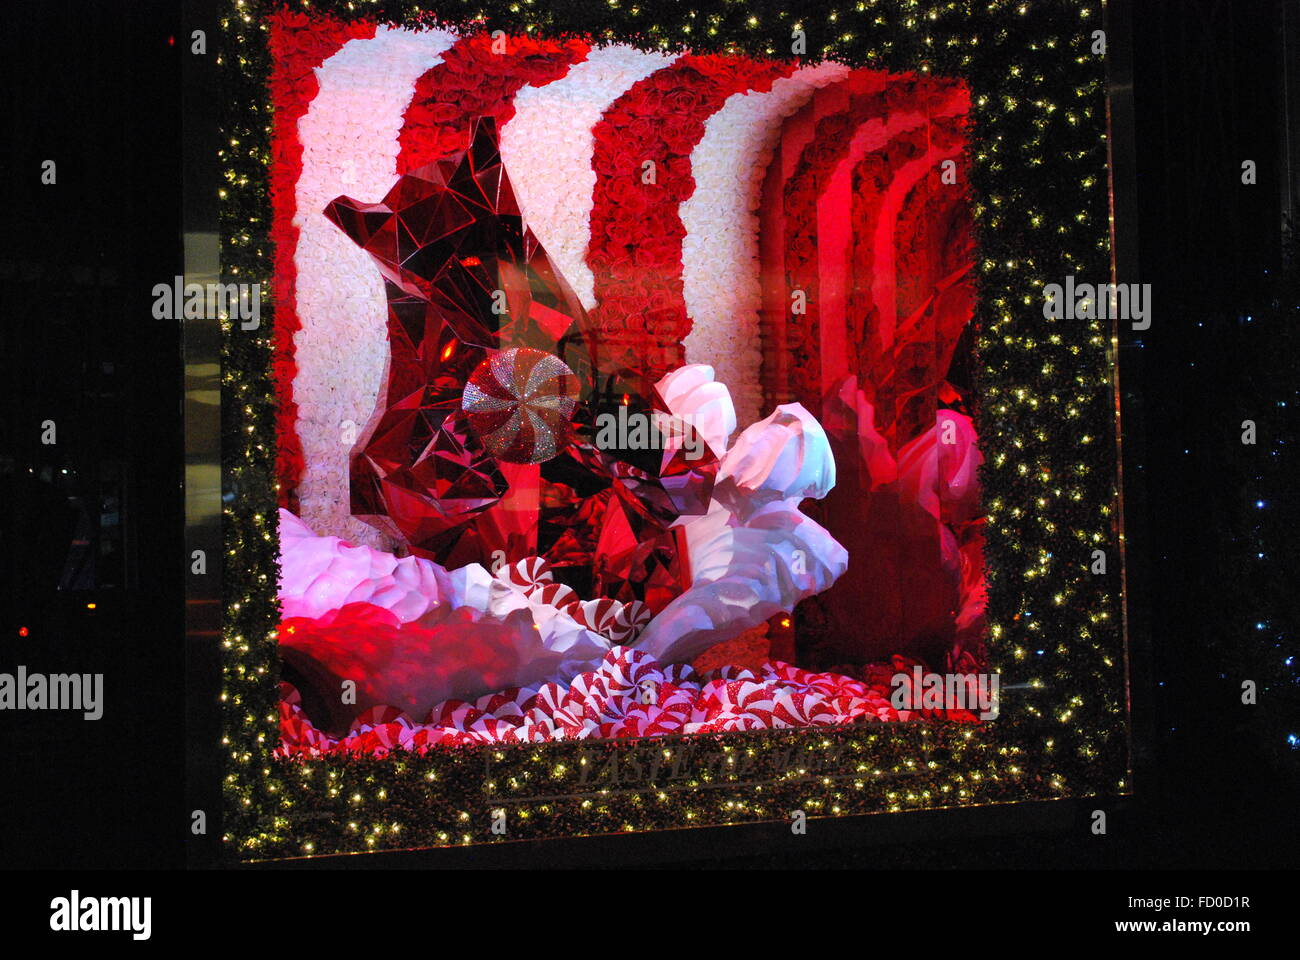 bloomingdales new york christmas stockfotos. Black Bedroom Furniture Sets. Home Design Ideas